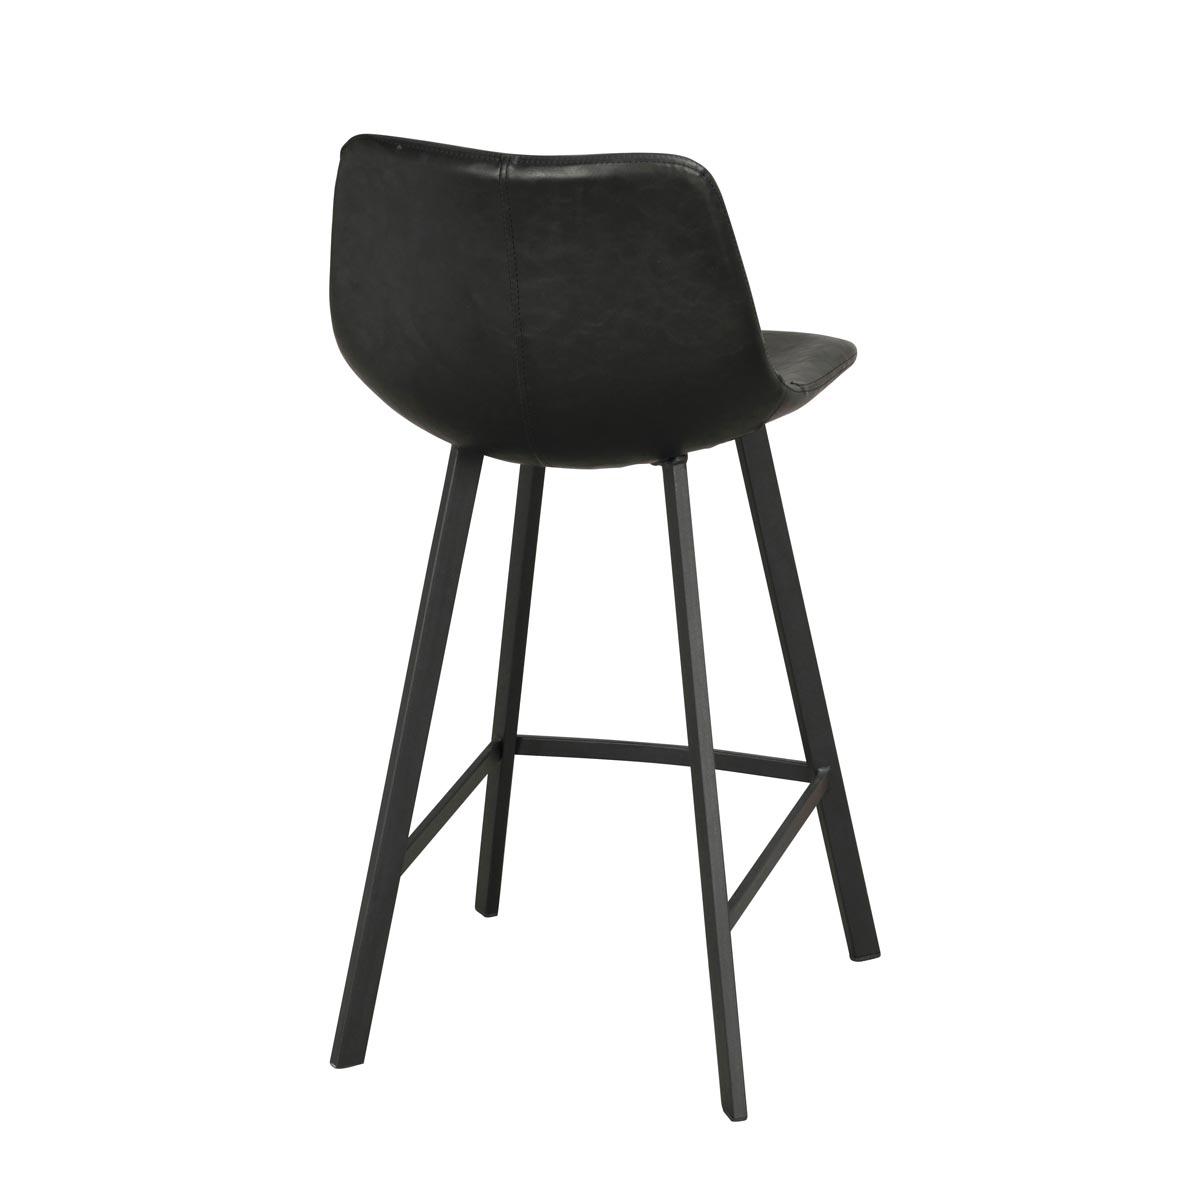 Alpha barstol svart svart rygg